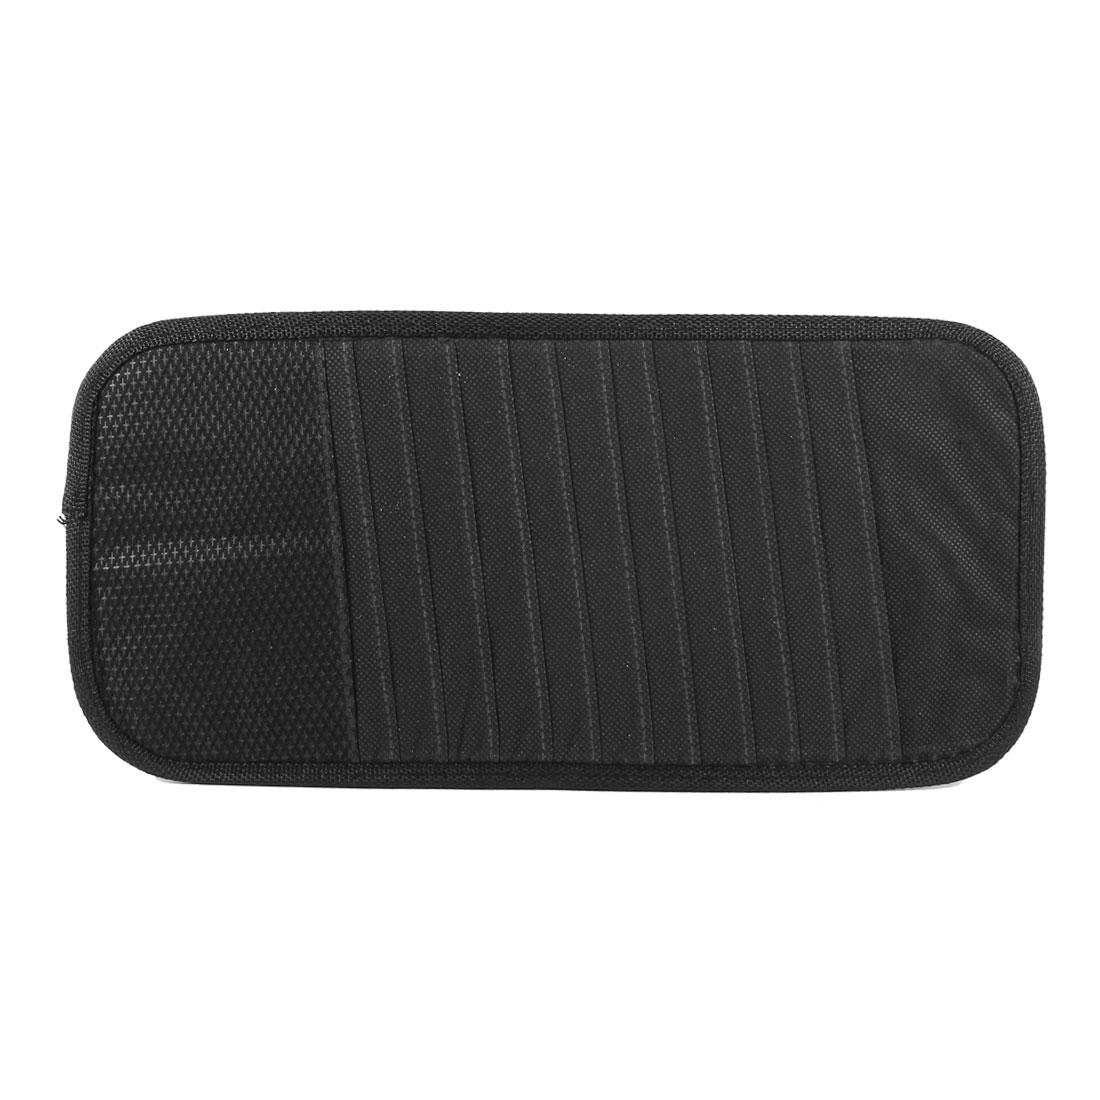 Vehicle Black Nylon Non Woven 12 Capacity CD DVD Discs Holder Bag Organizer